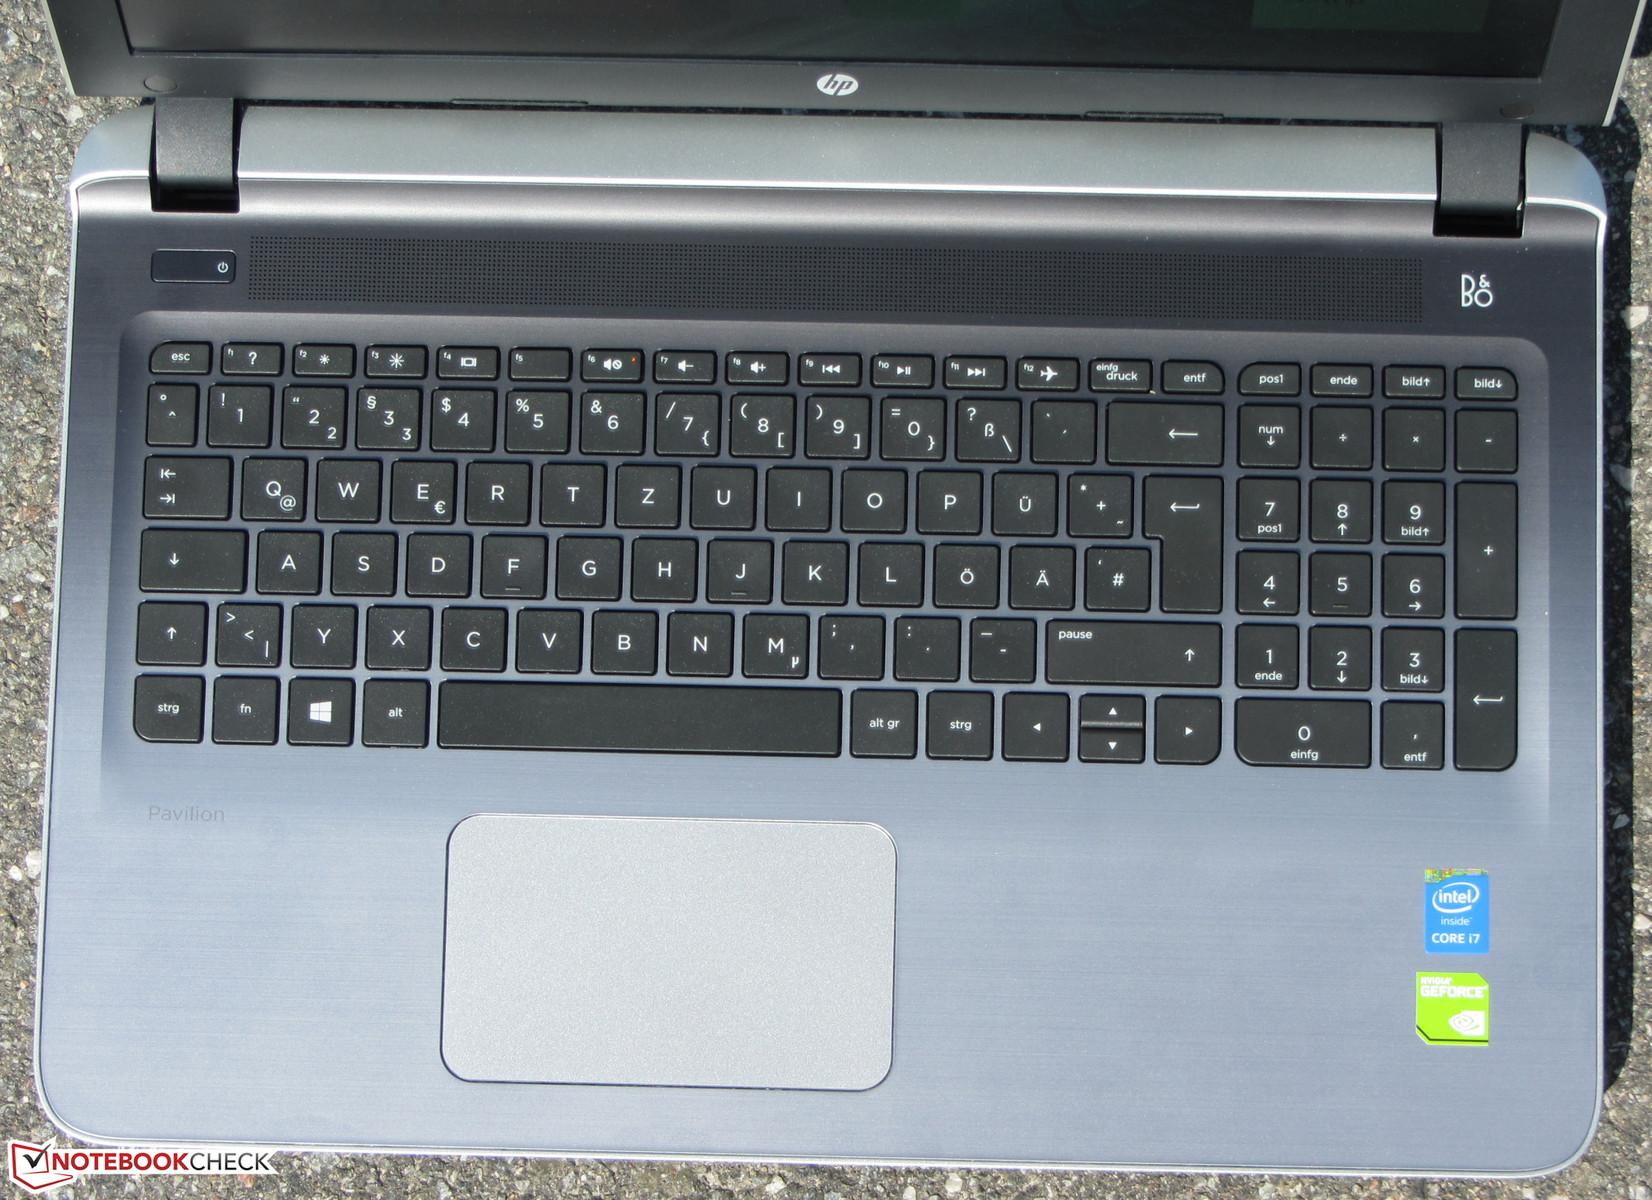 hp pavilion 15 notebook review notebookcheck net reviewsDiagram 15 Hp Laptop #21